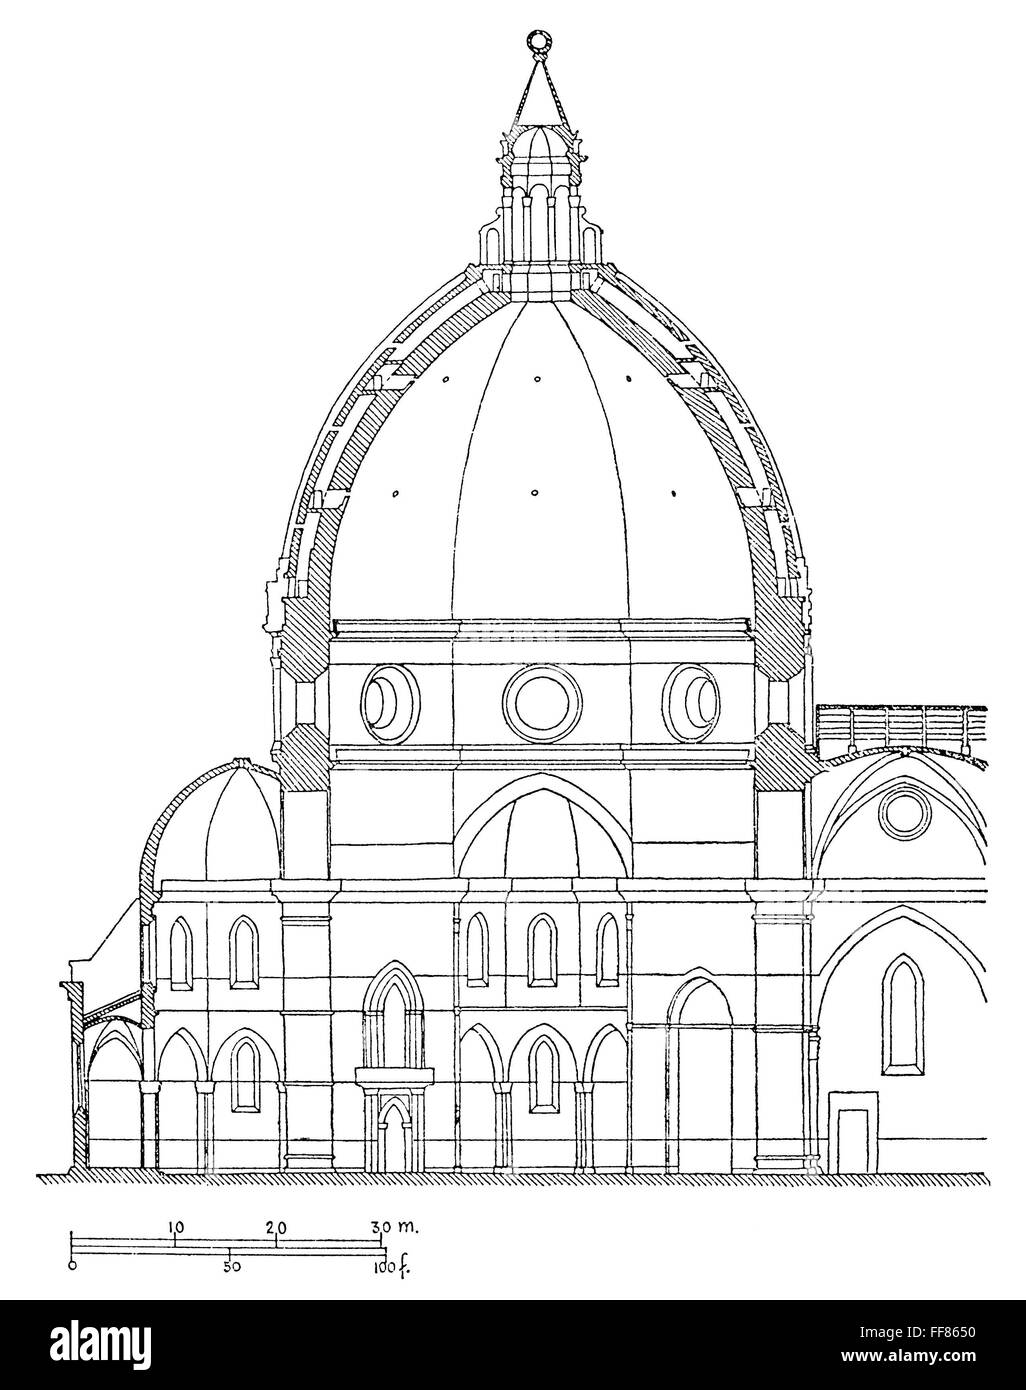 BRUNELLESCHI DOME PLAN NModern Diagram Of The Cross Section Filippo Brunelleschis Dome